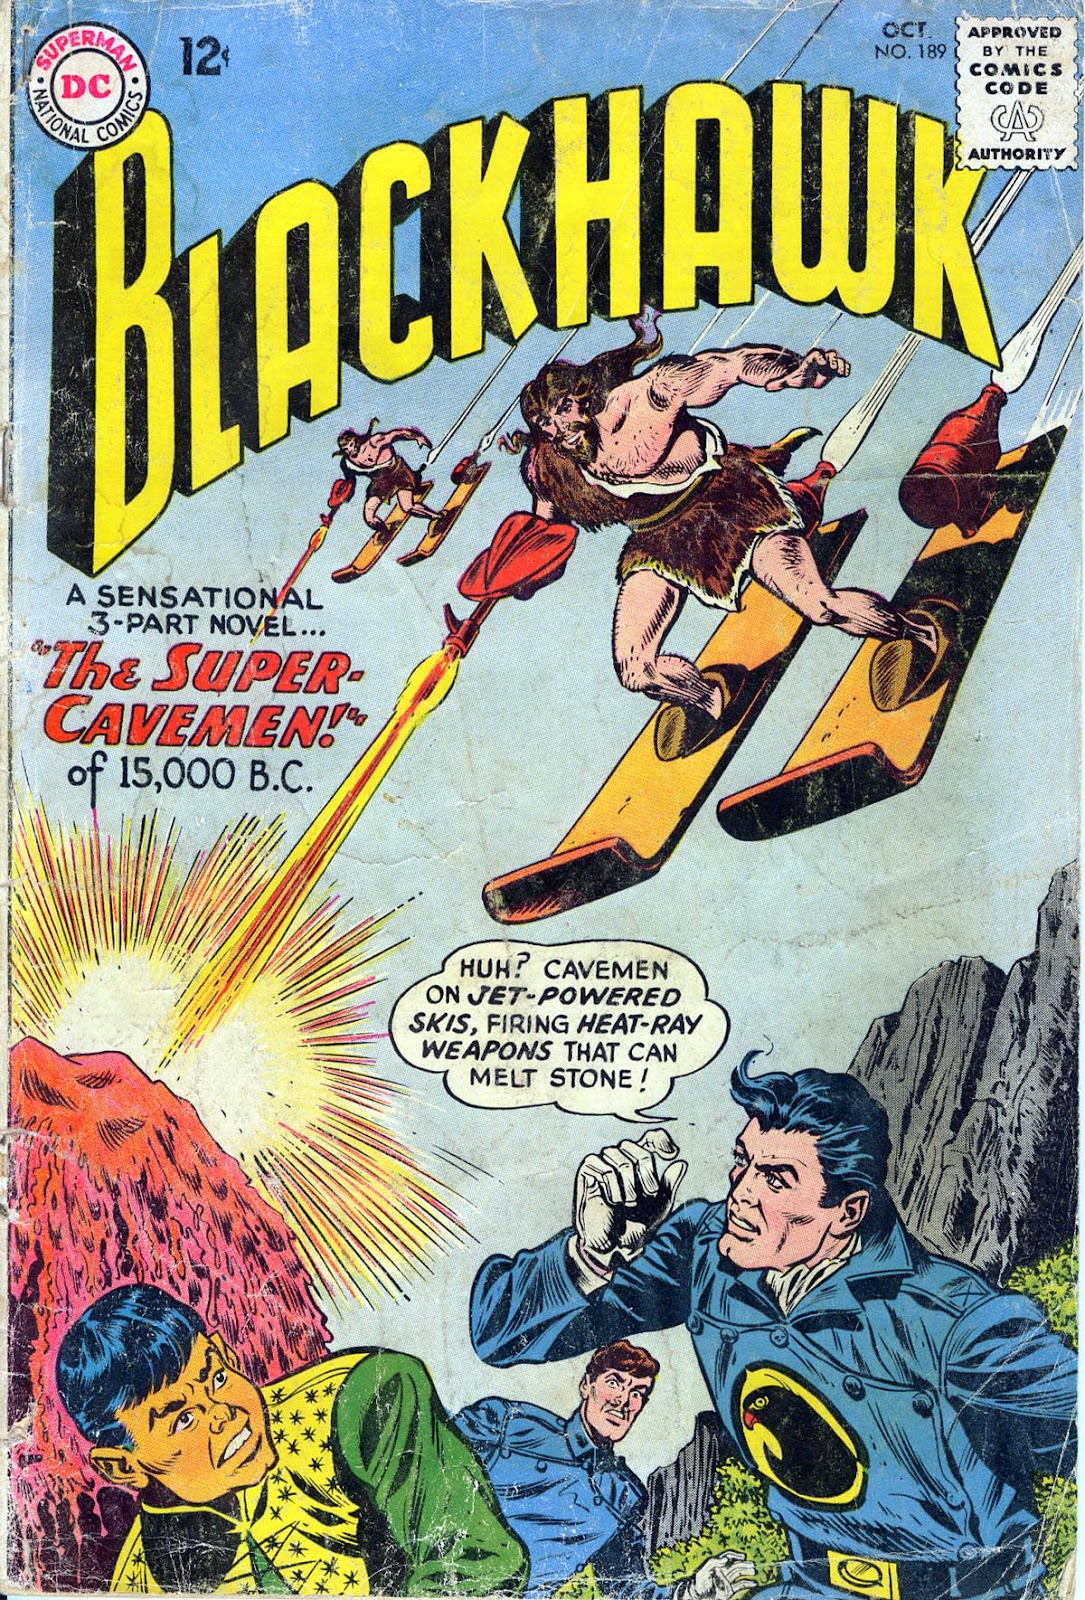 Blackhawk (1957) Issue #189 #82 - English 1